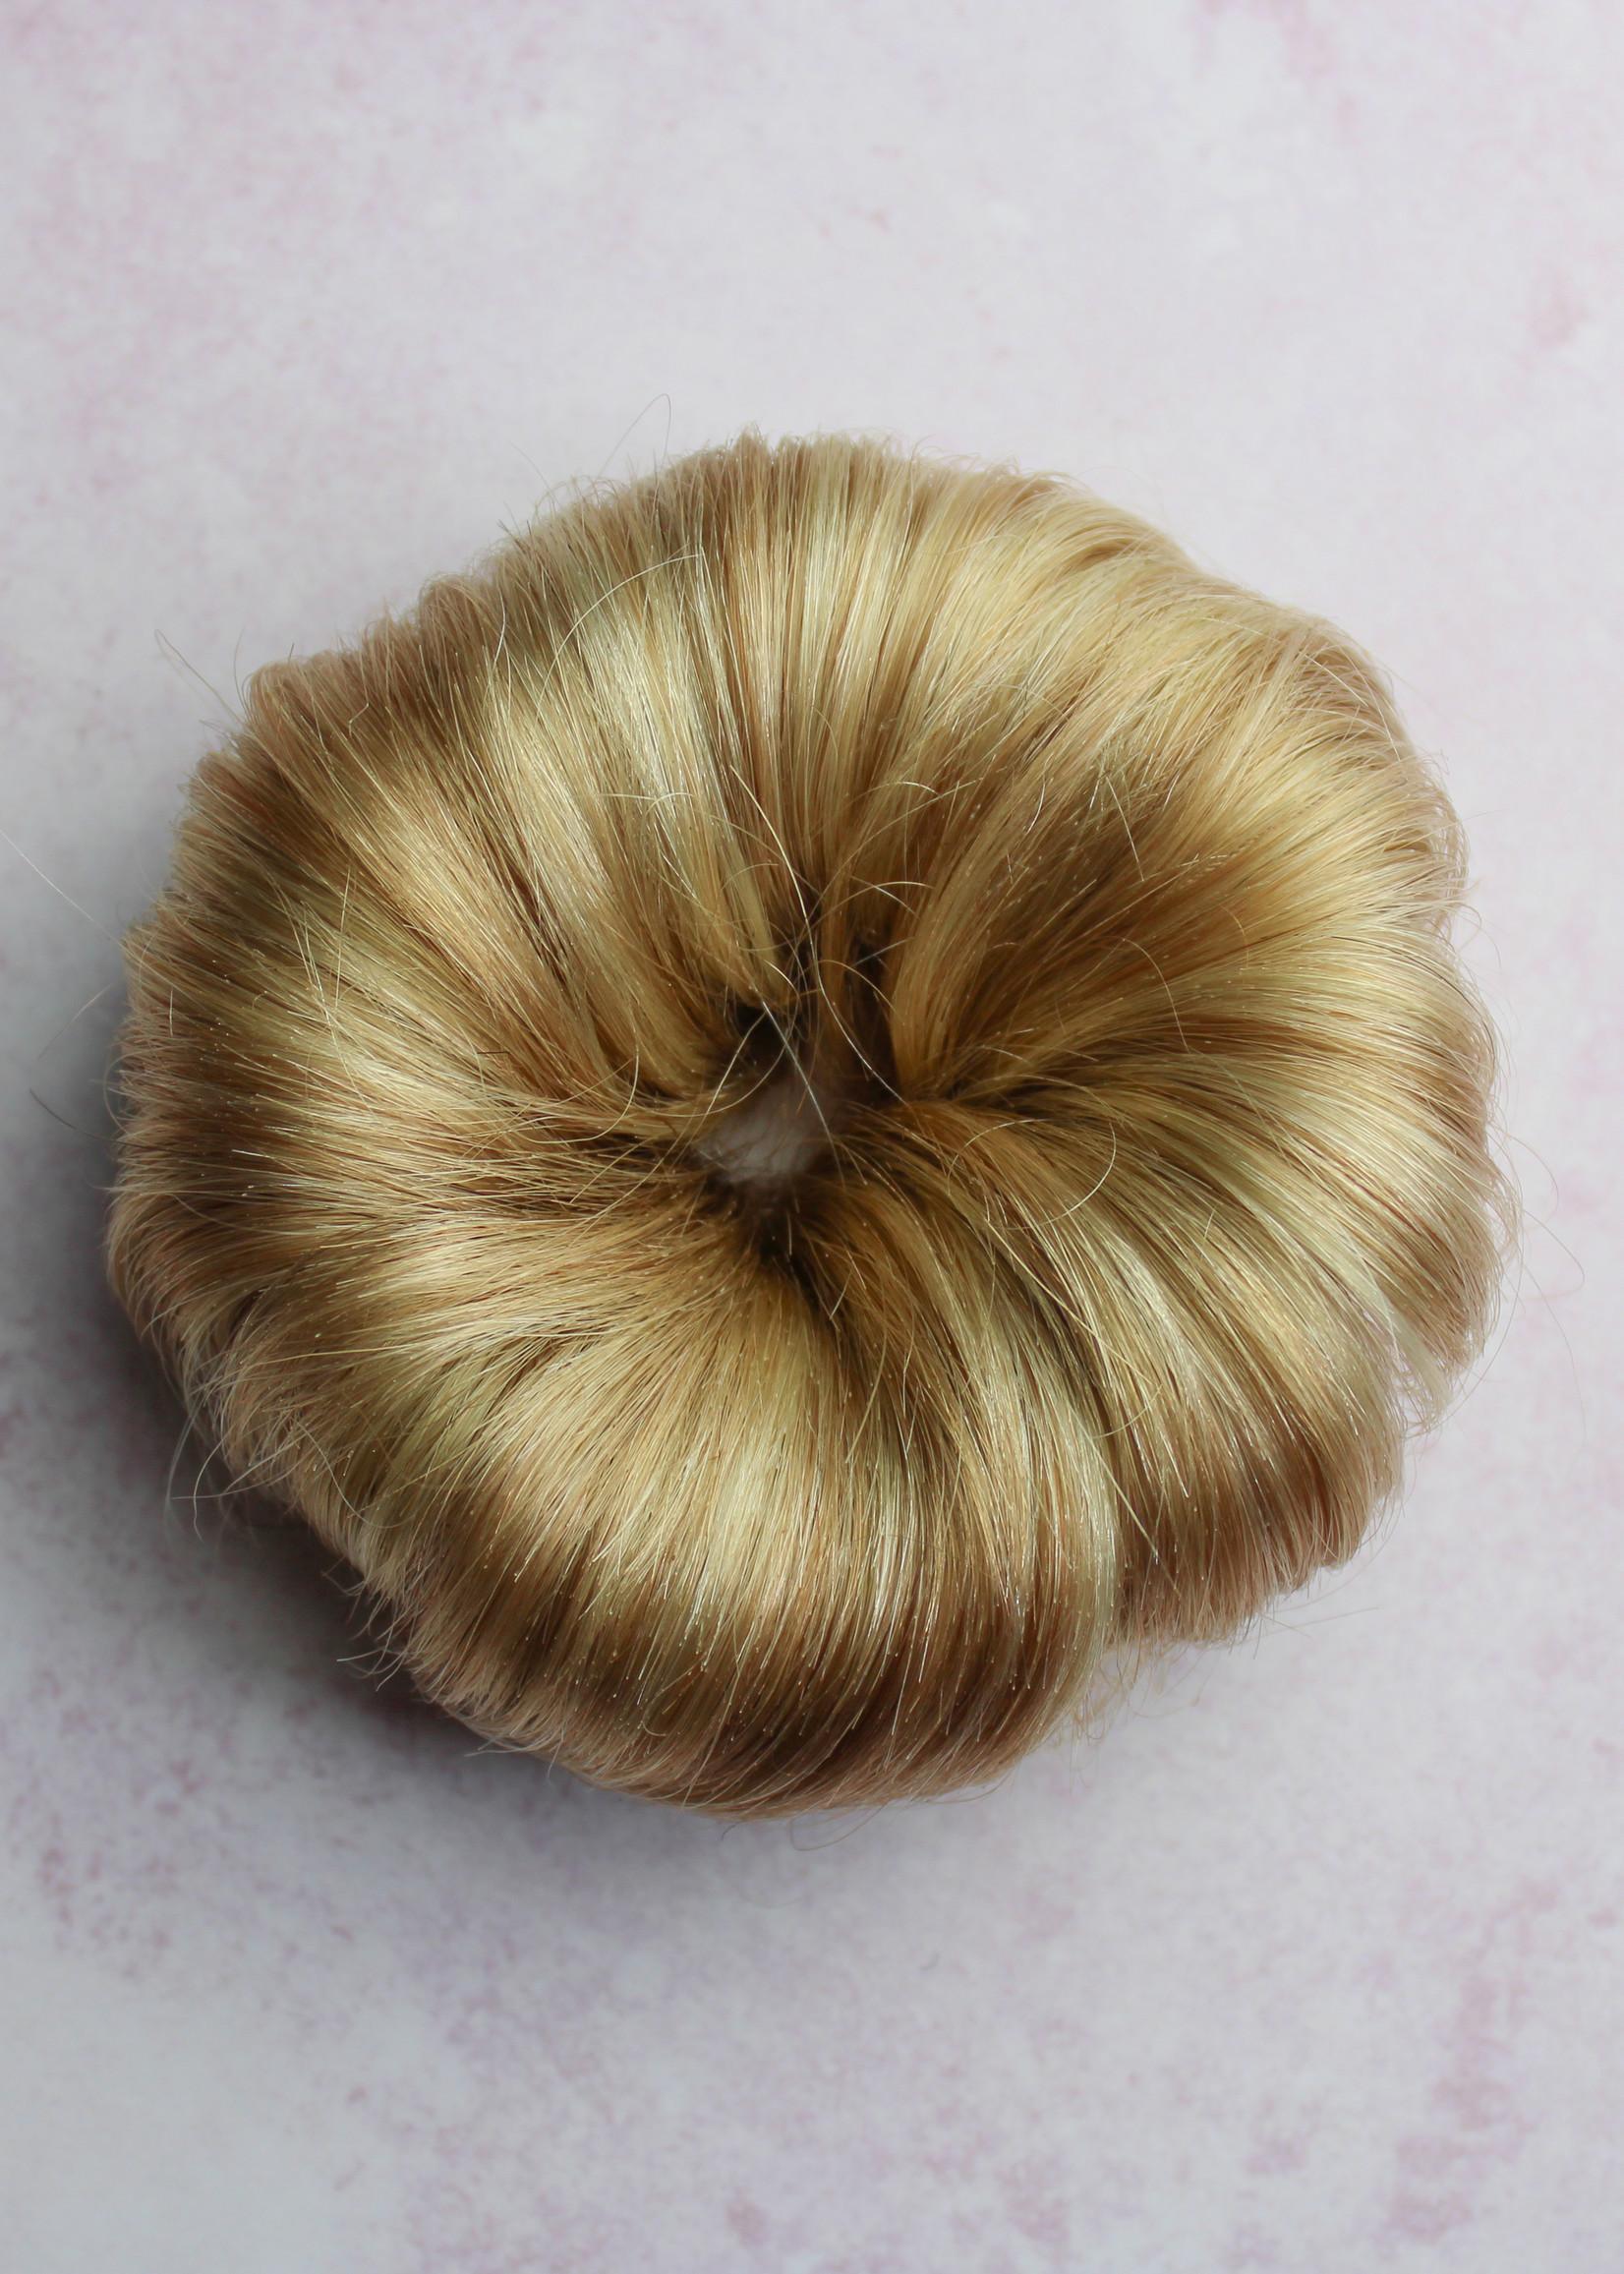 Human Hair Buns - Color 20/60